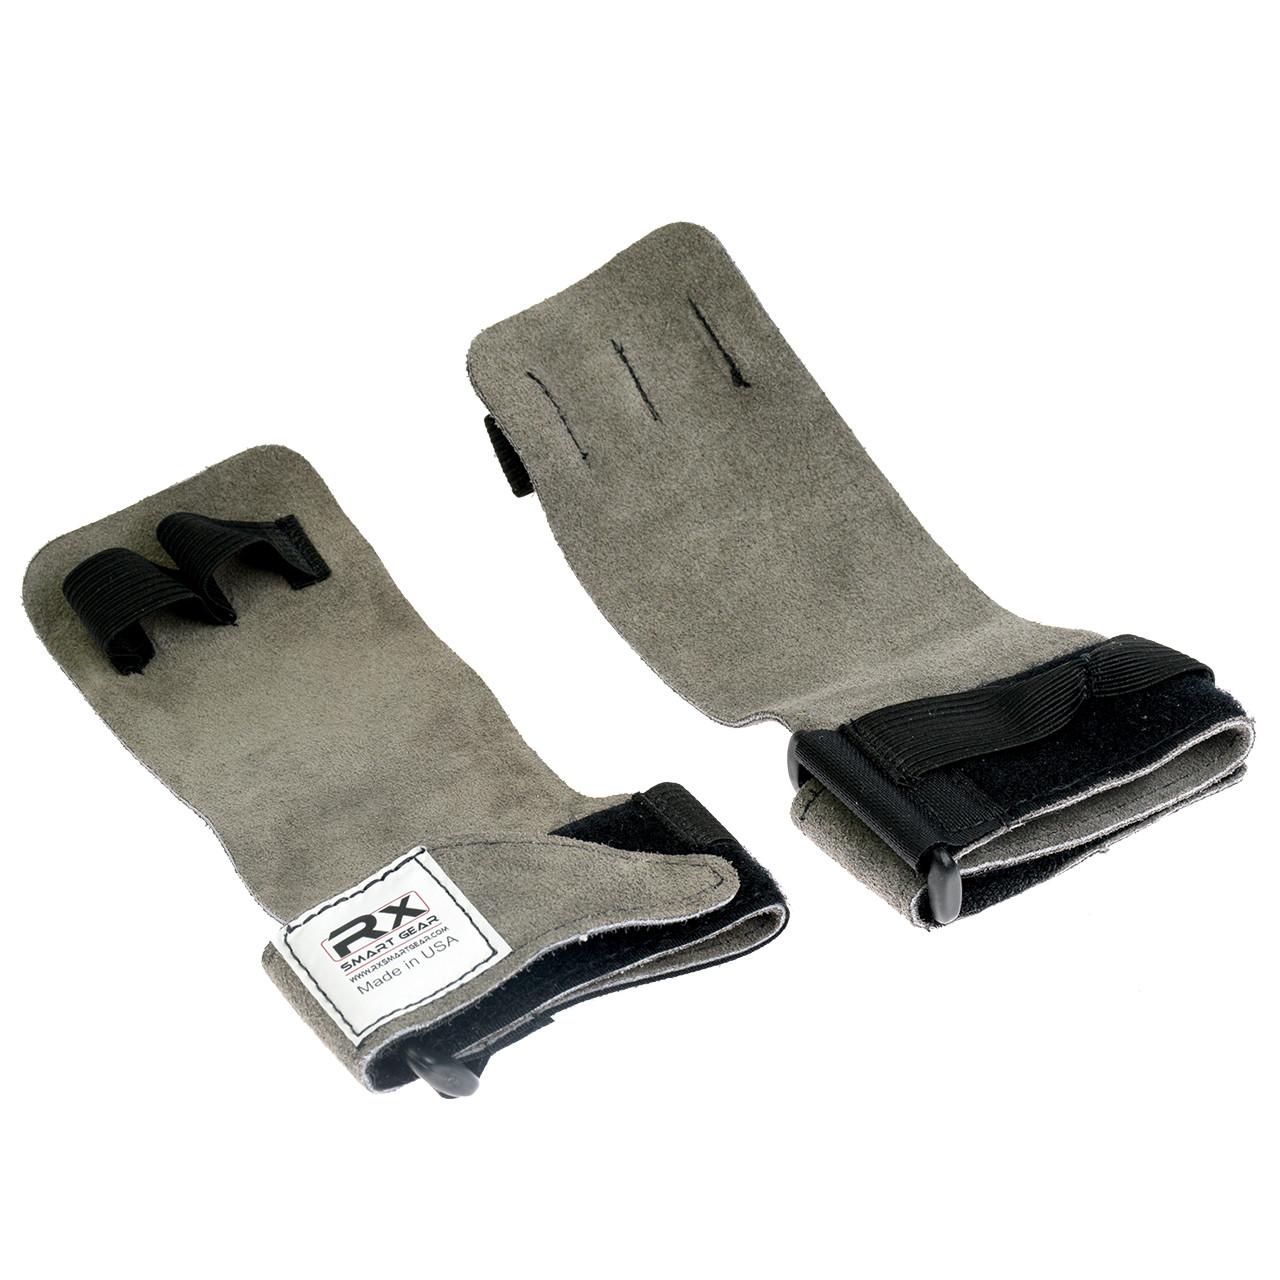 7945dbc5bf1 Rx Smart Grips | Rx Smart Gear